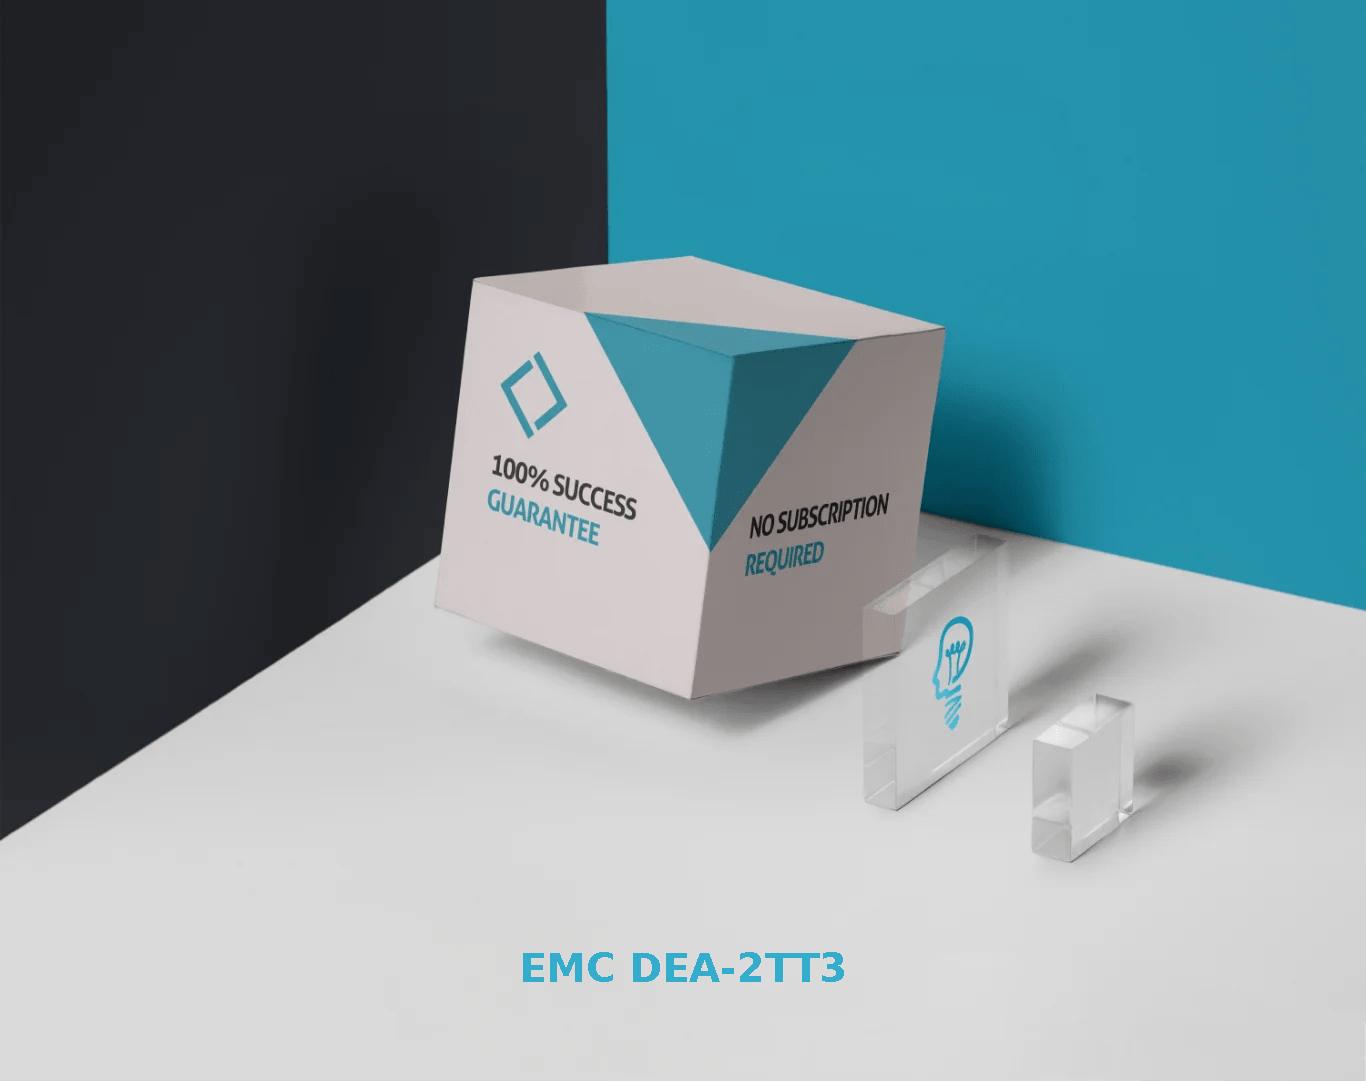 EMC DEA-2TT3 Exams